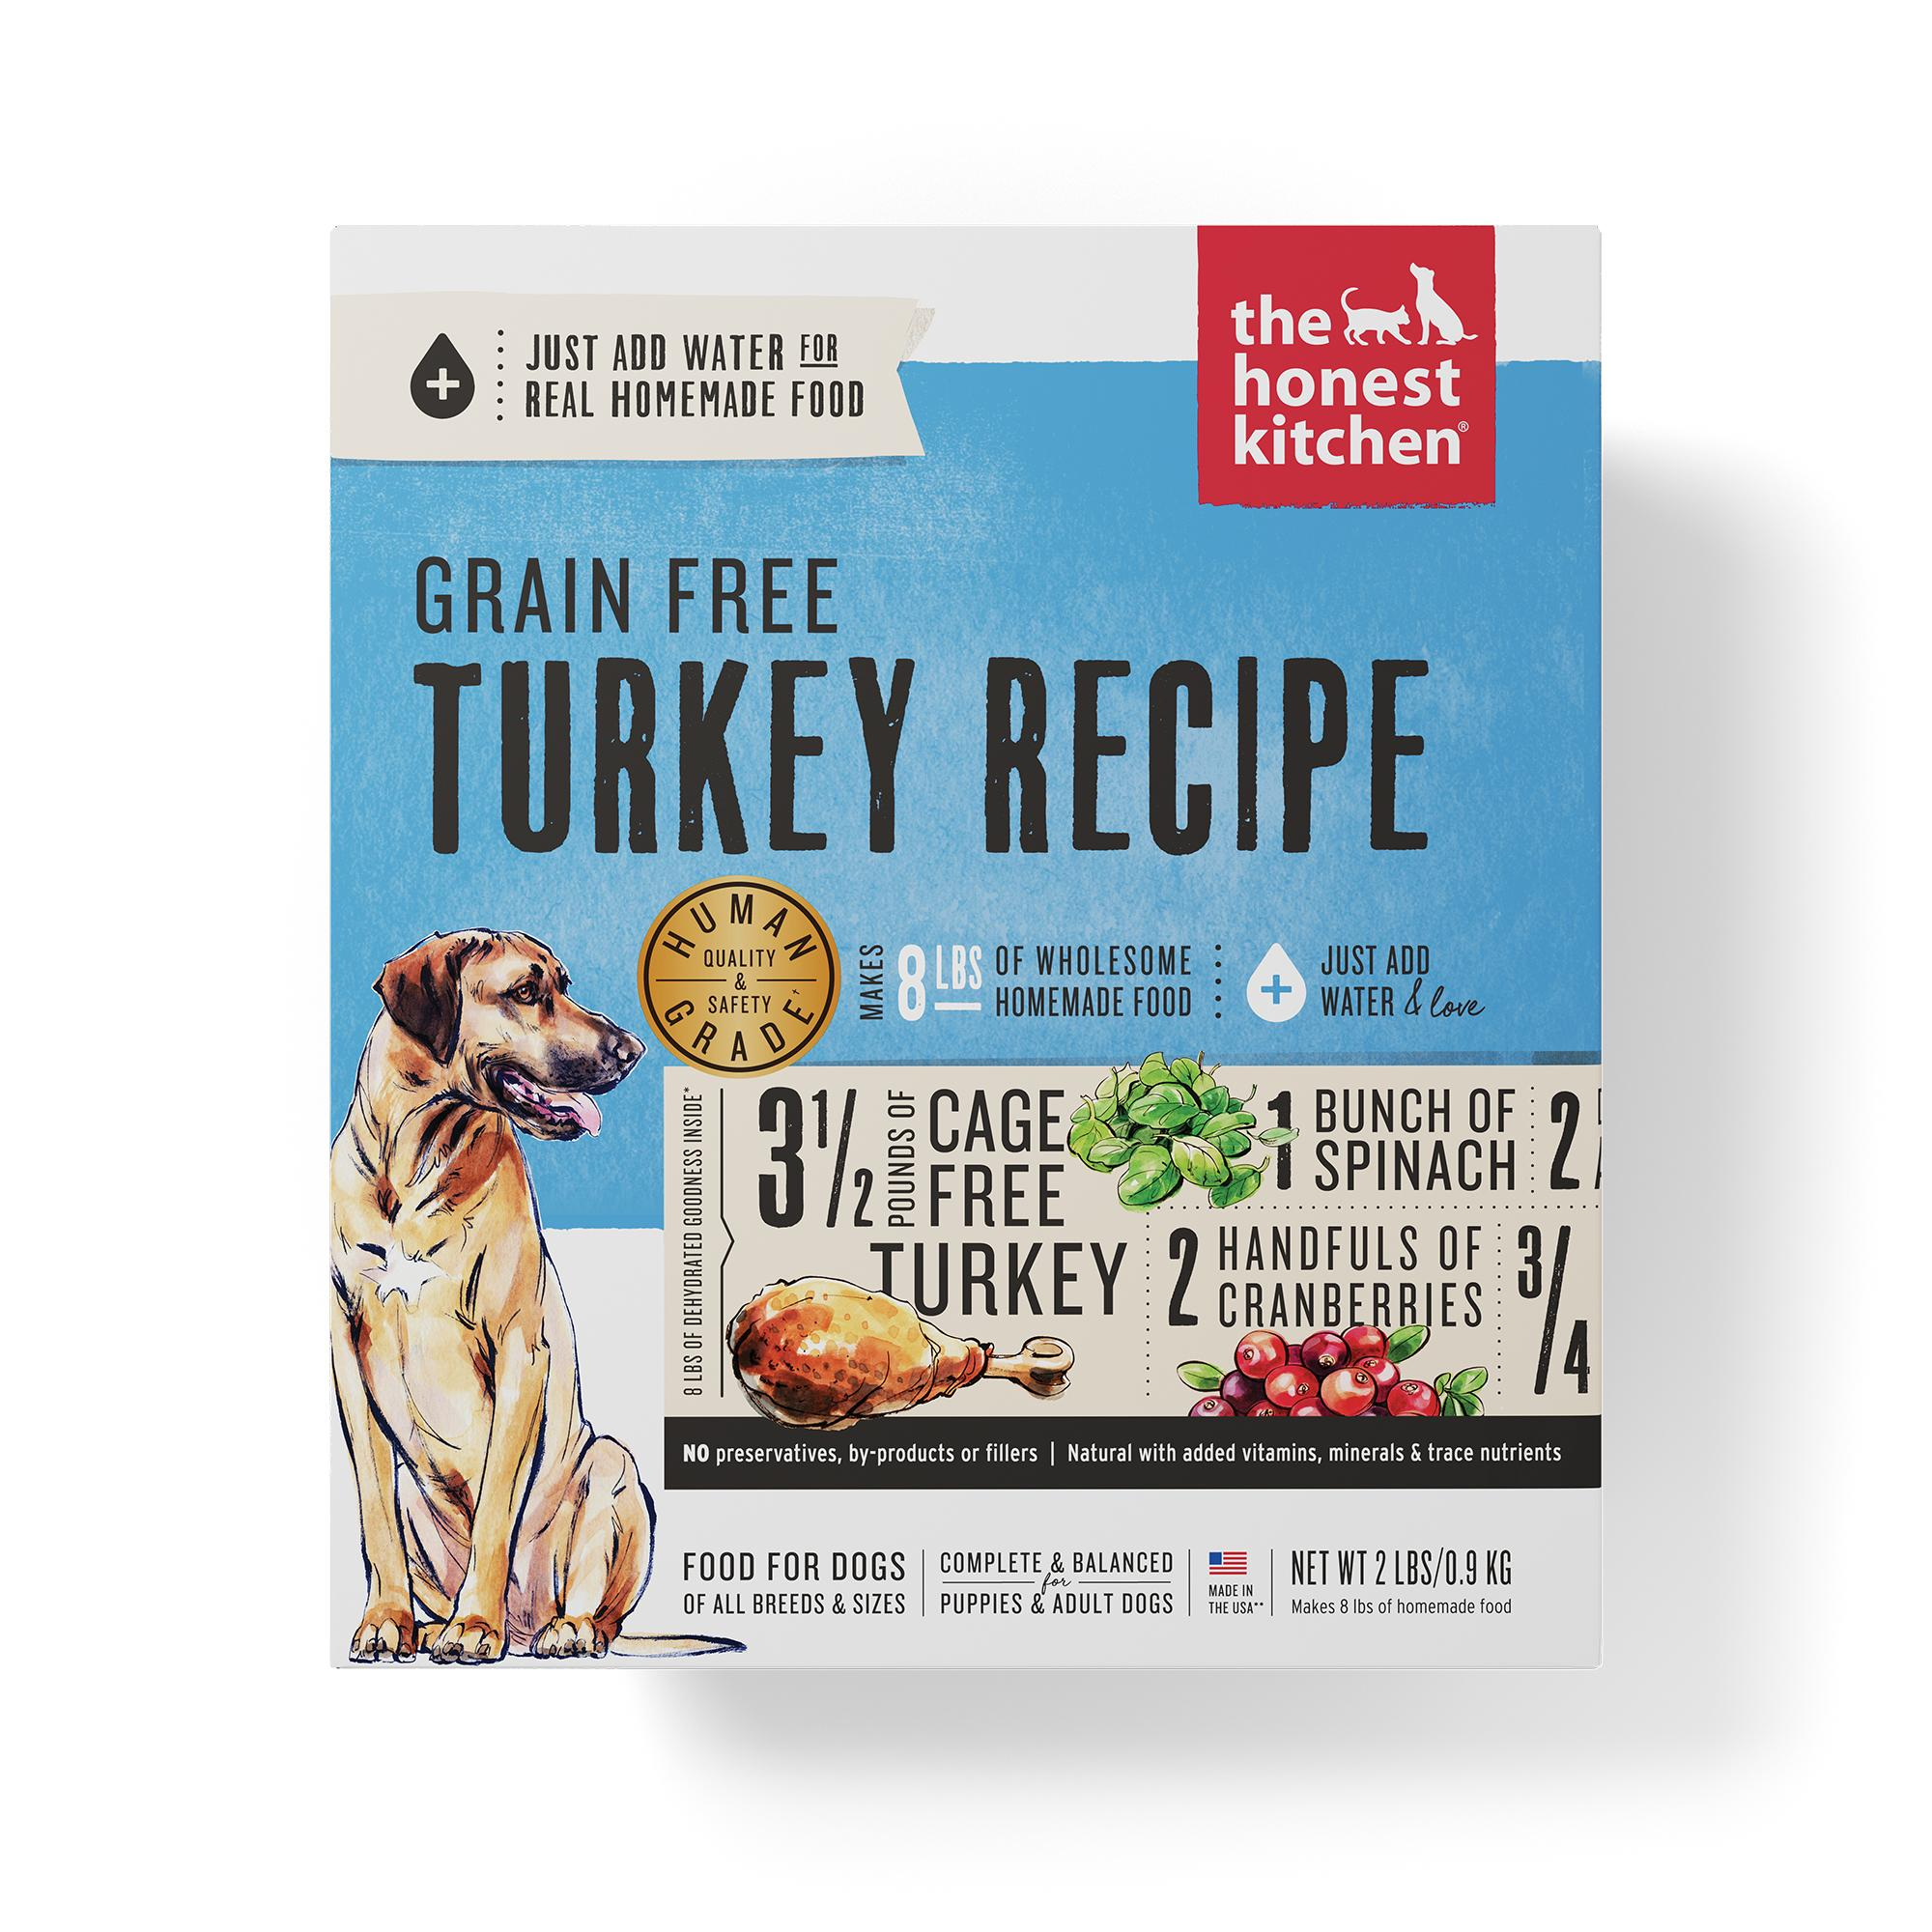 The Honest Kitchen Turkey Recipe Grain-Free Dehydrated Dog Food, 2-lb box